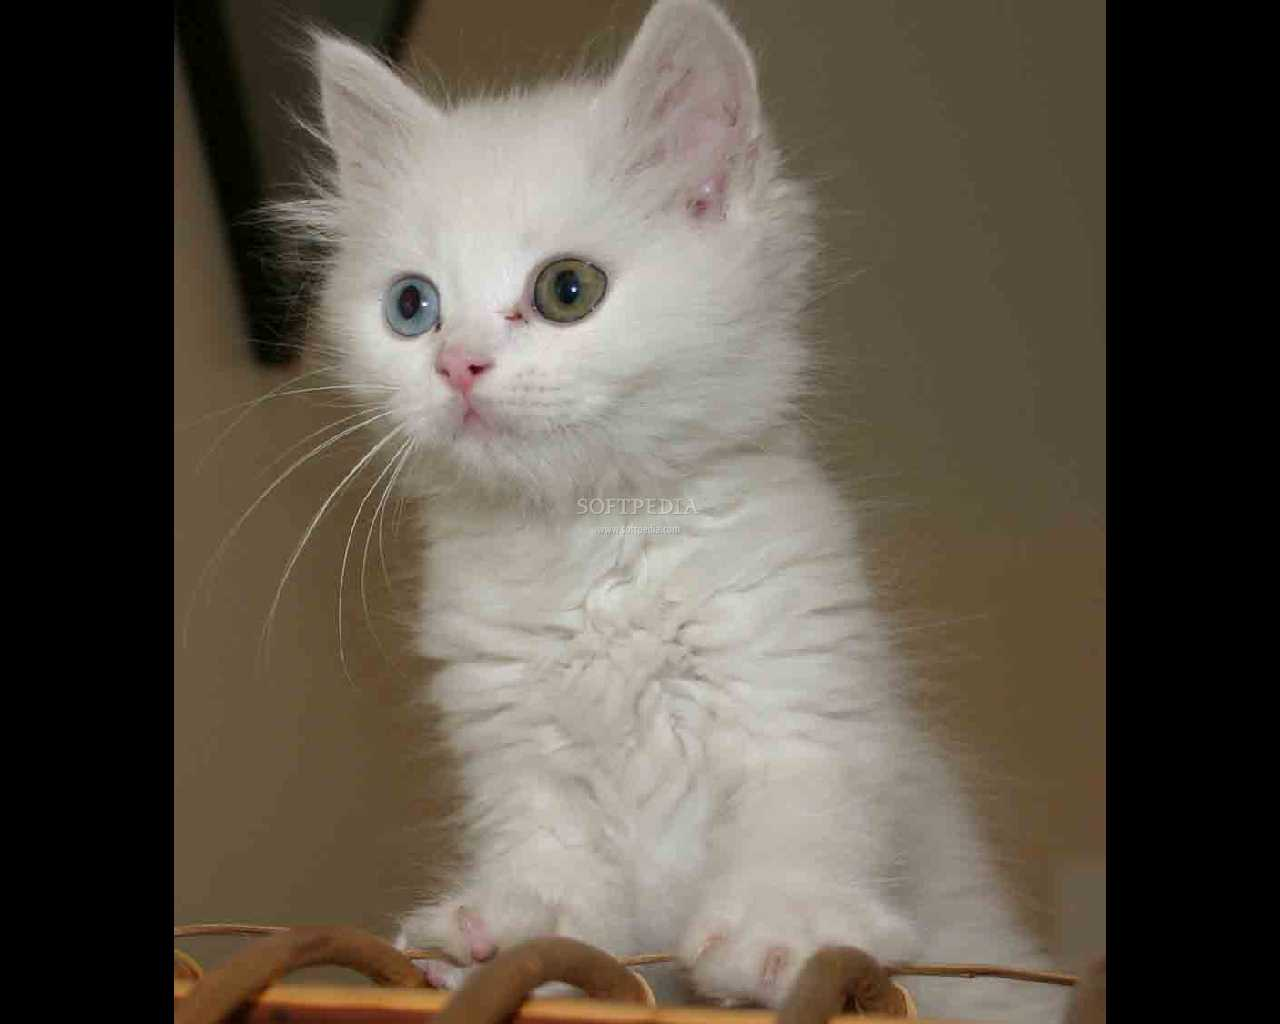 >> صور قطط << تبع المسابقه << White-Cats-Screensaver_1.jpg